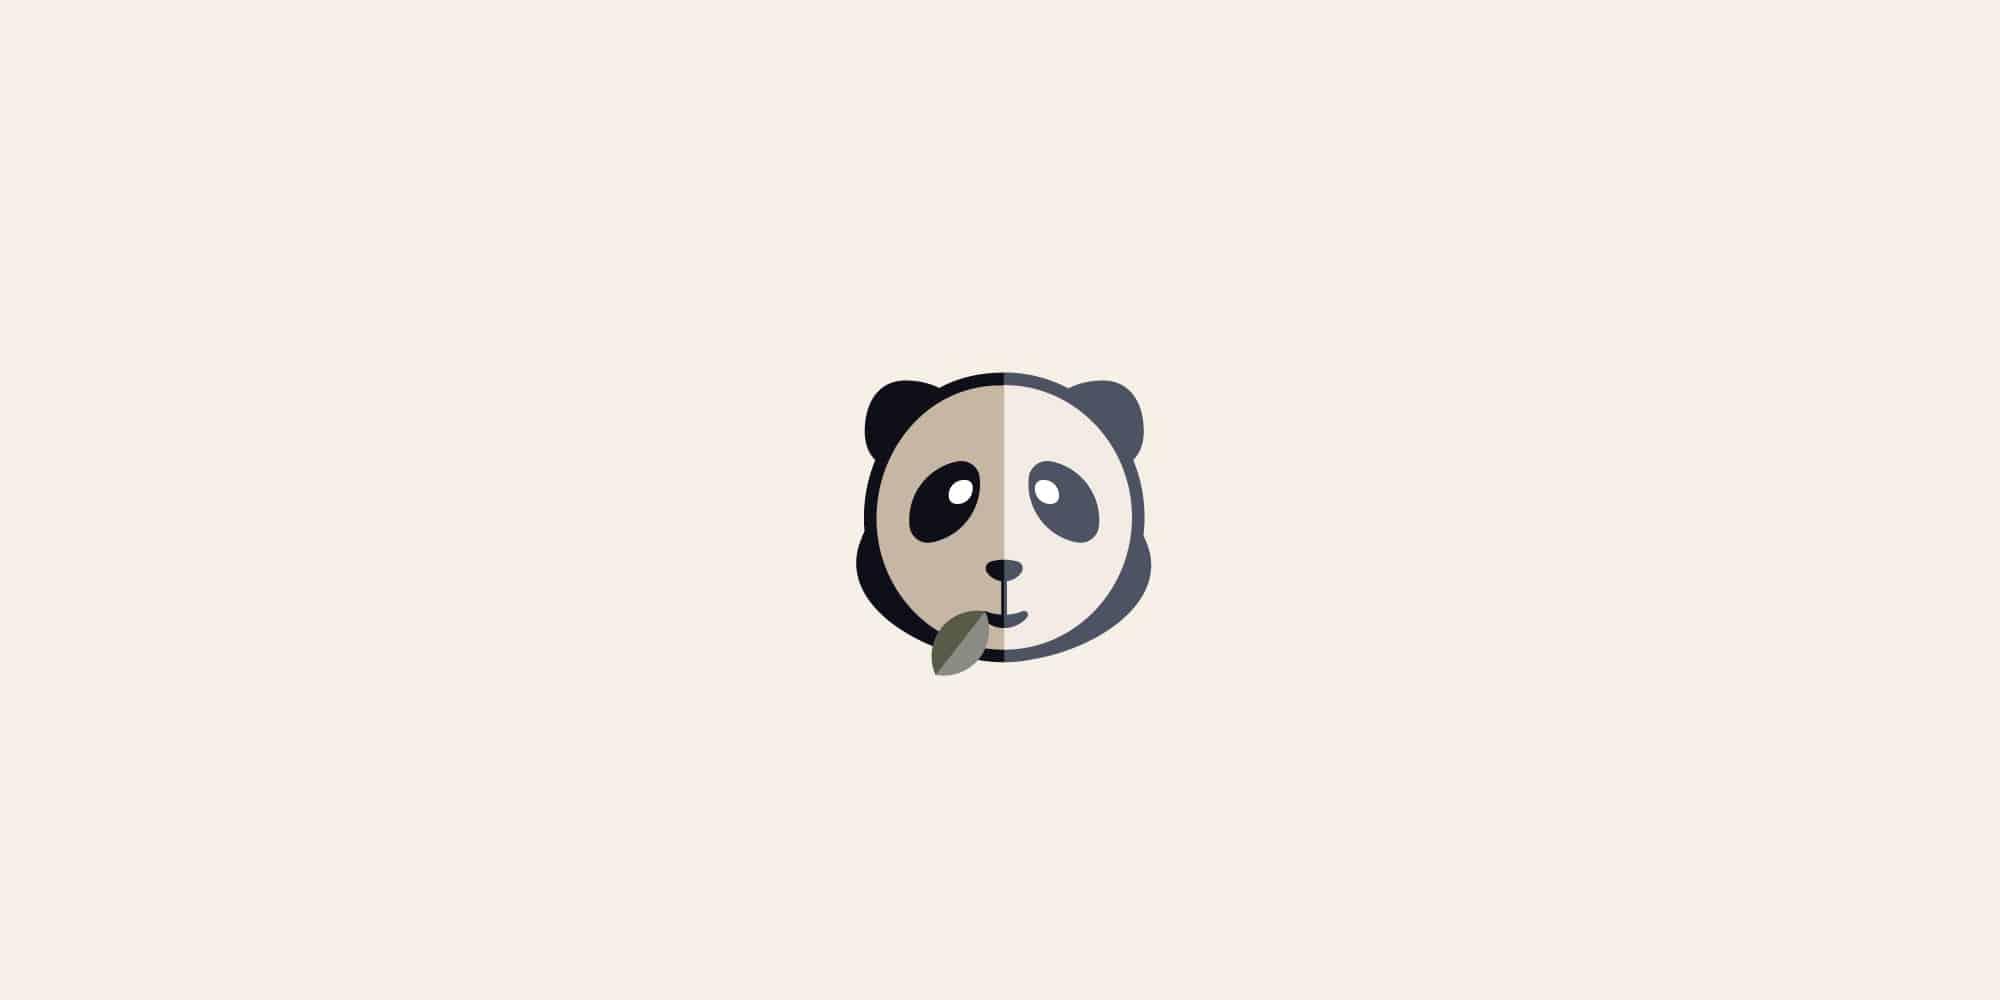 Google Panda: Everything You Need To Know 🐼